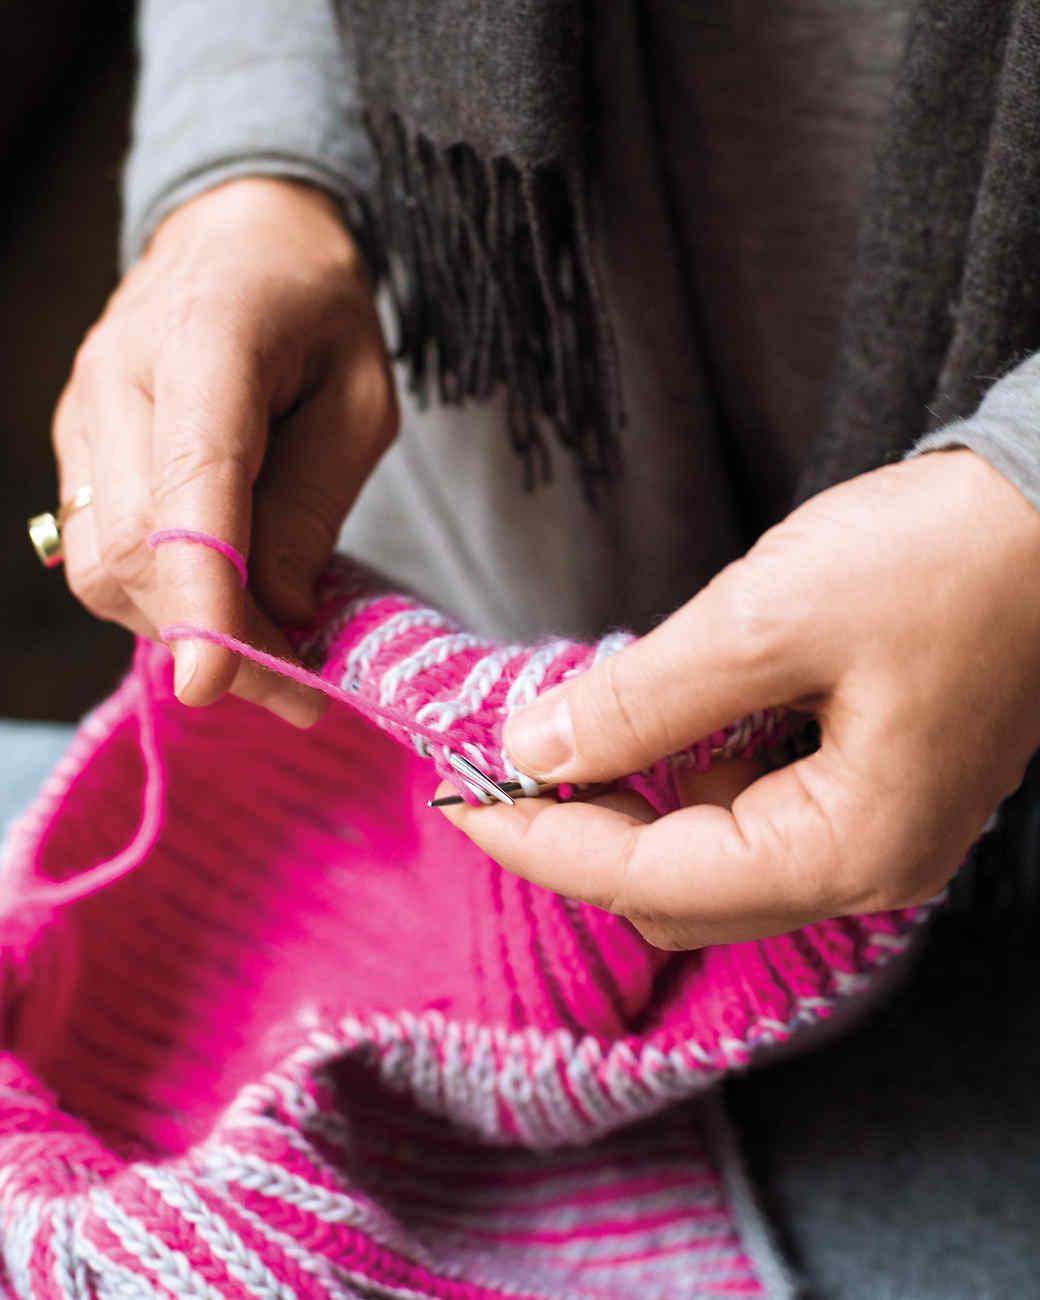 knitting-md110821.jpg